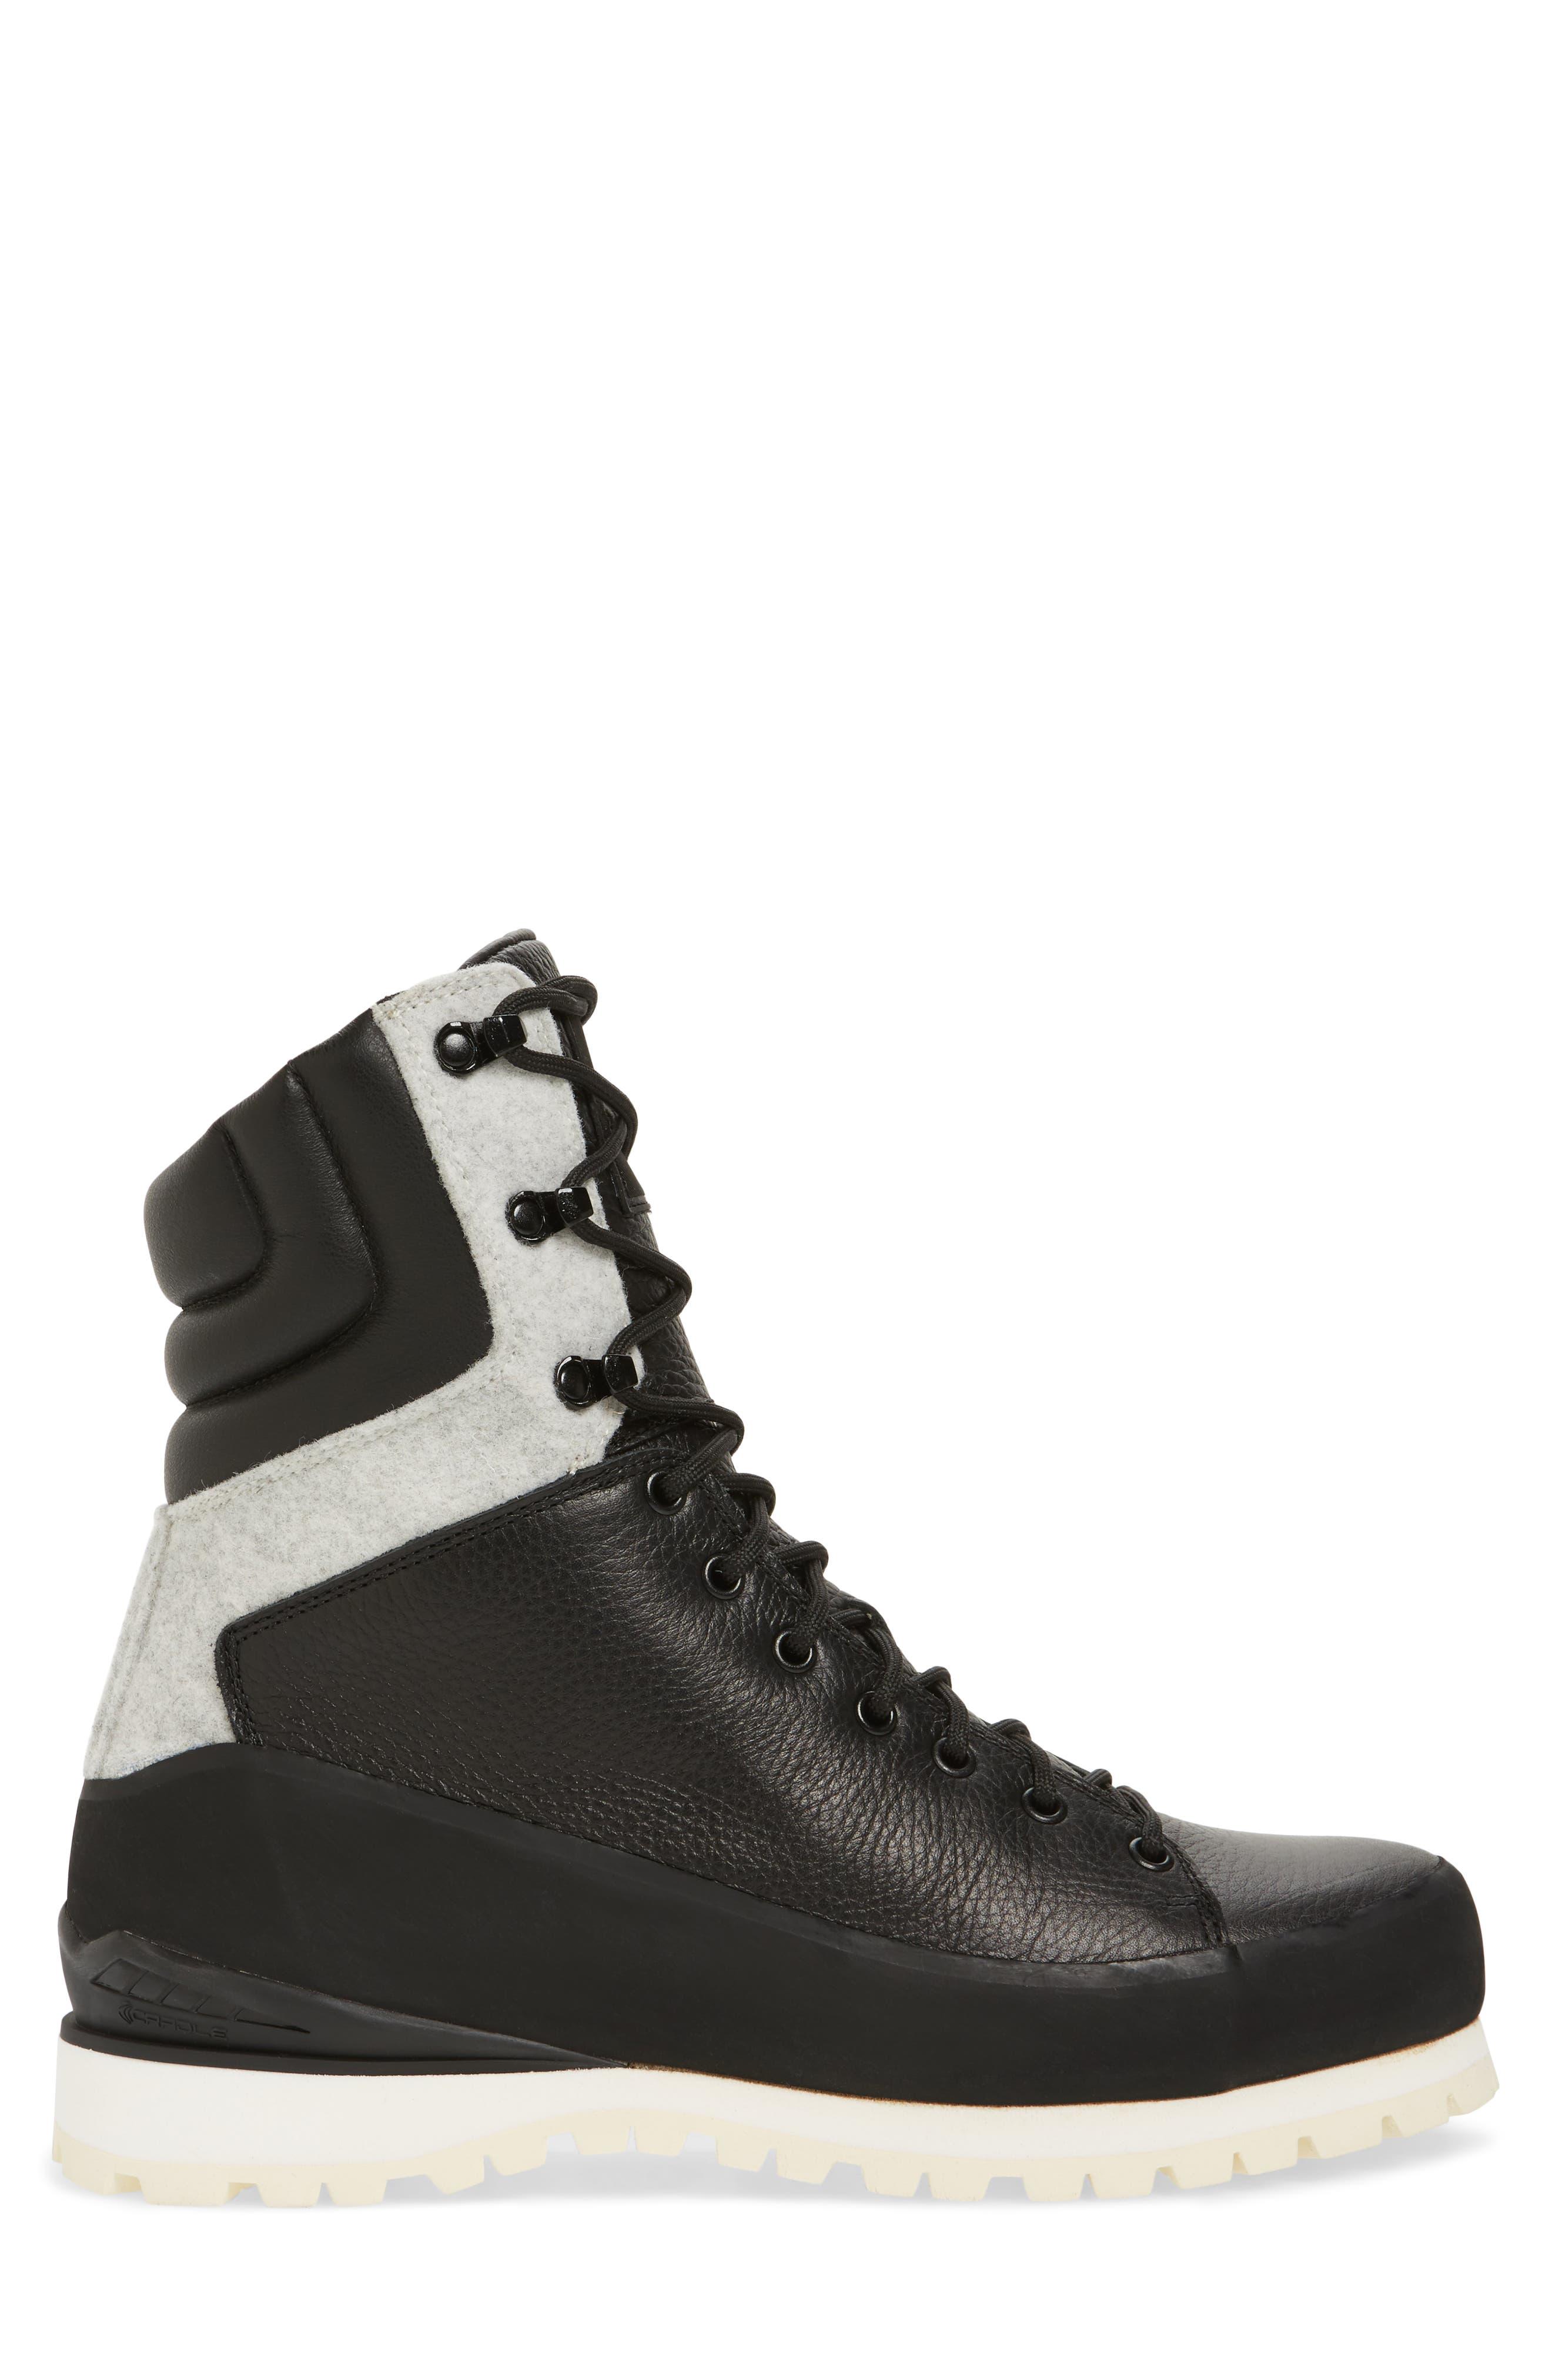 Cryos Boot,                             Alternate thumbnail 3, color,                             TNF BLACK/ GLACIER WHITE